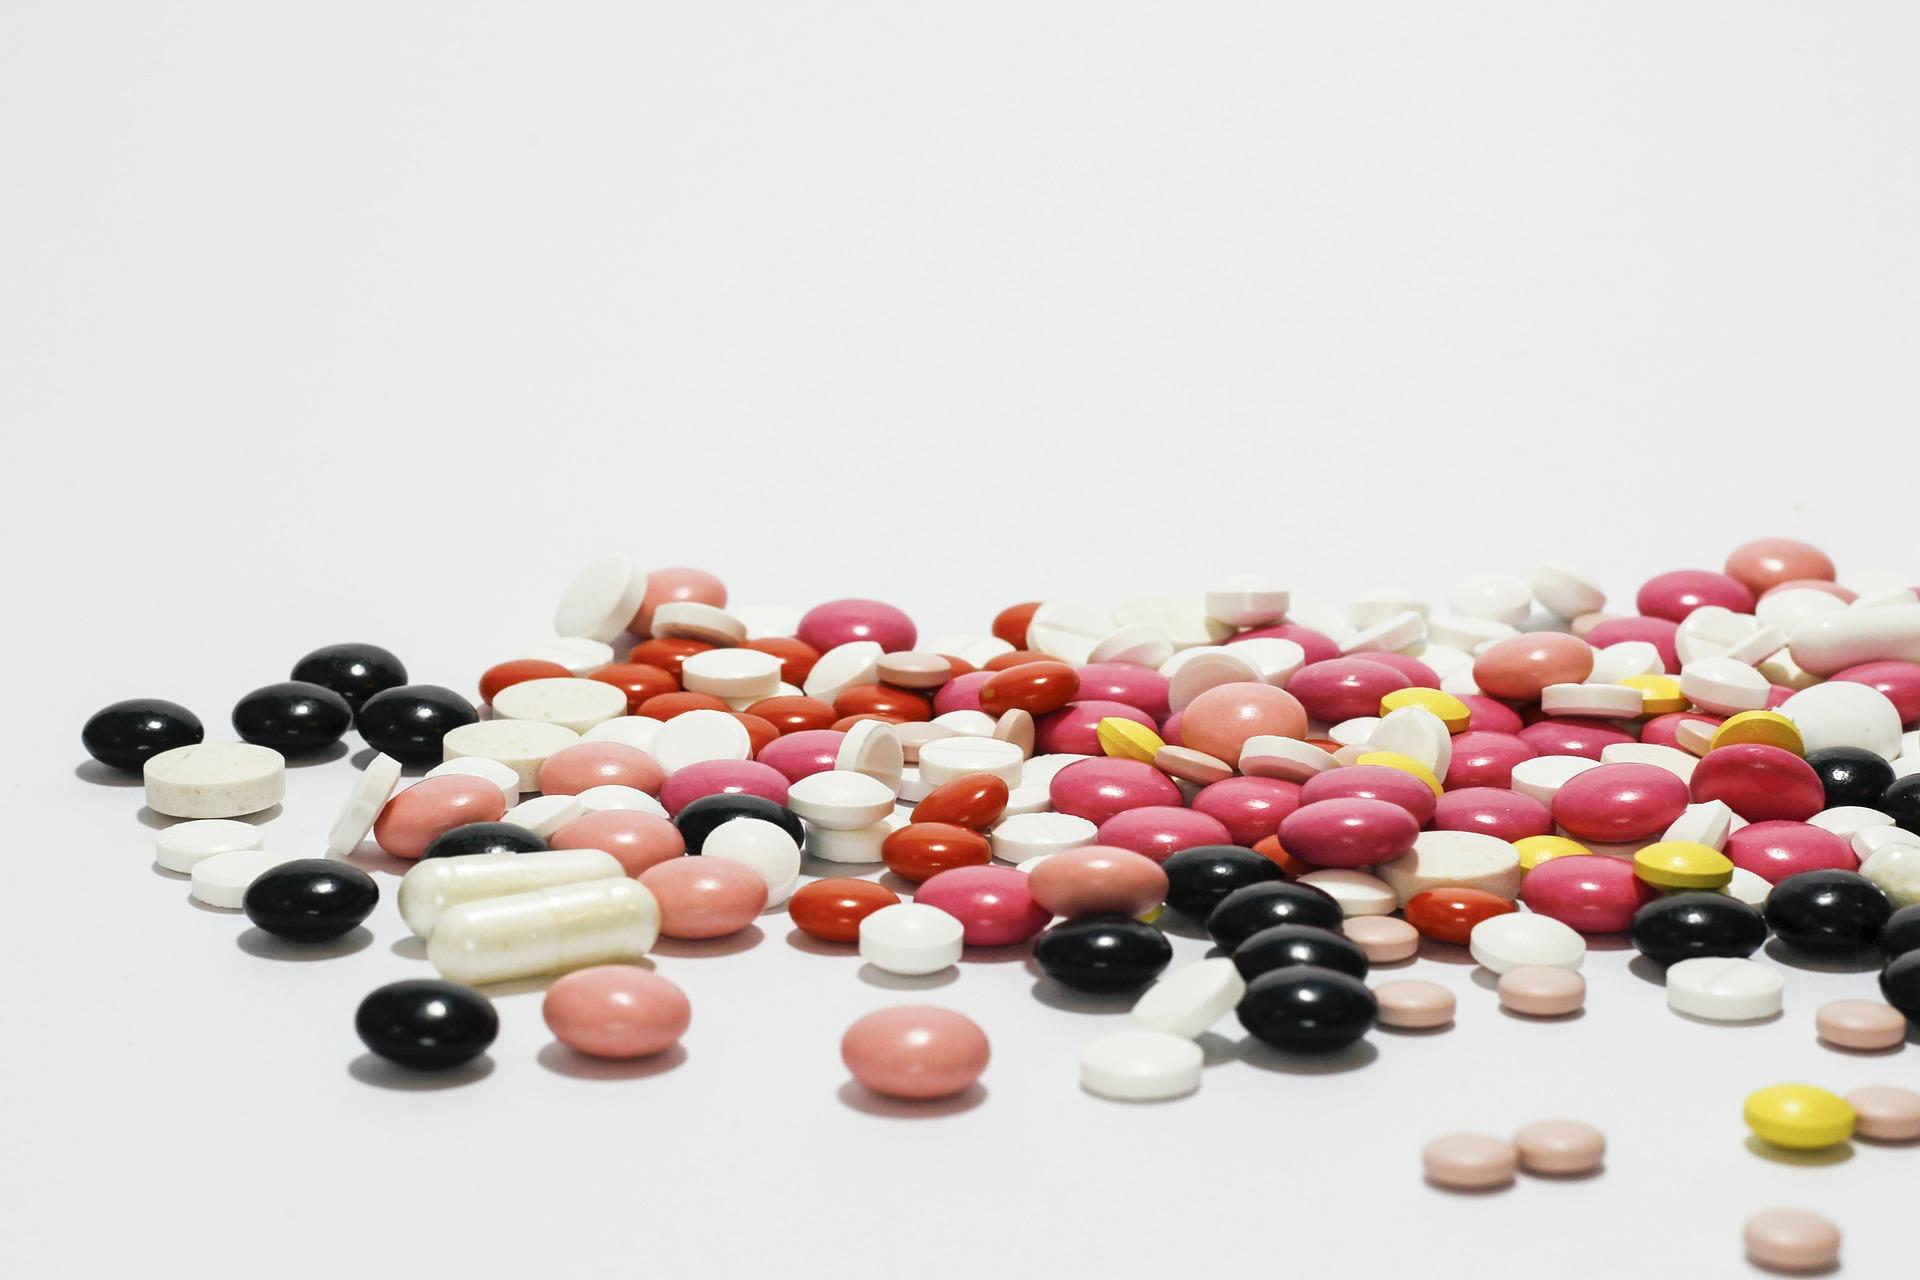 medications-342462_1920